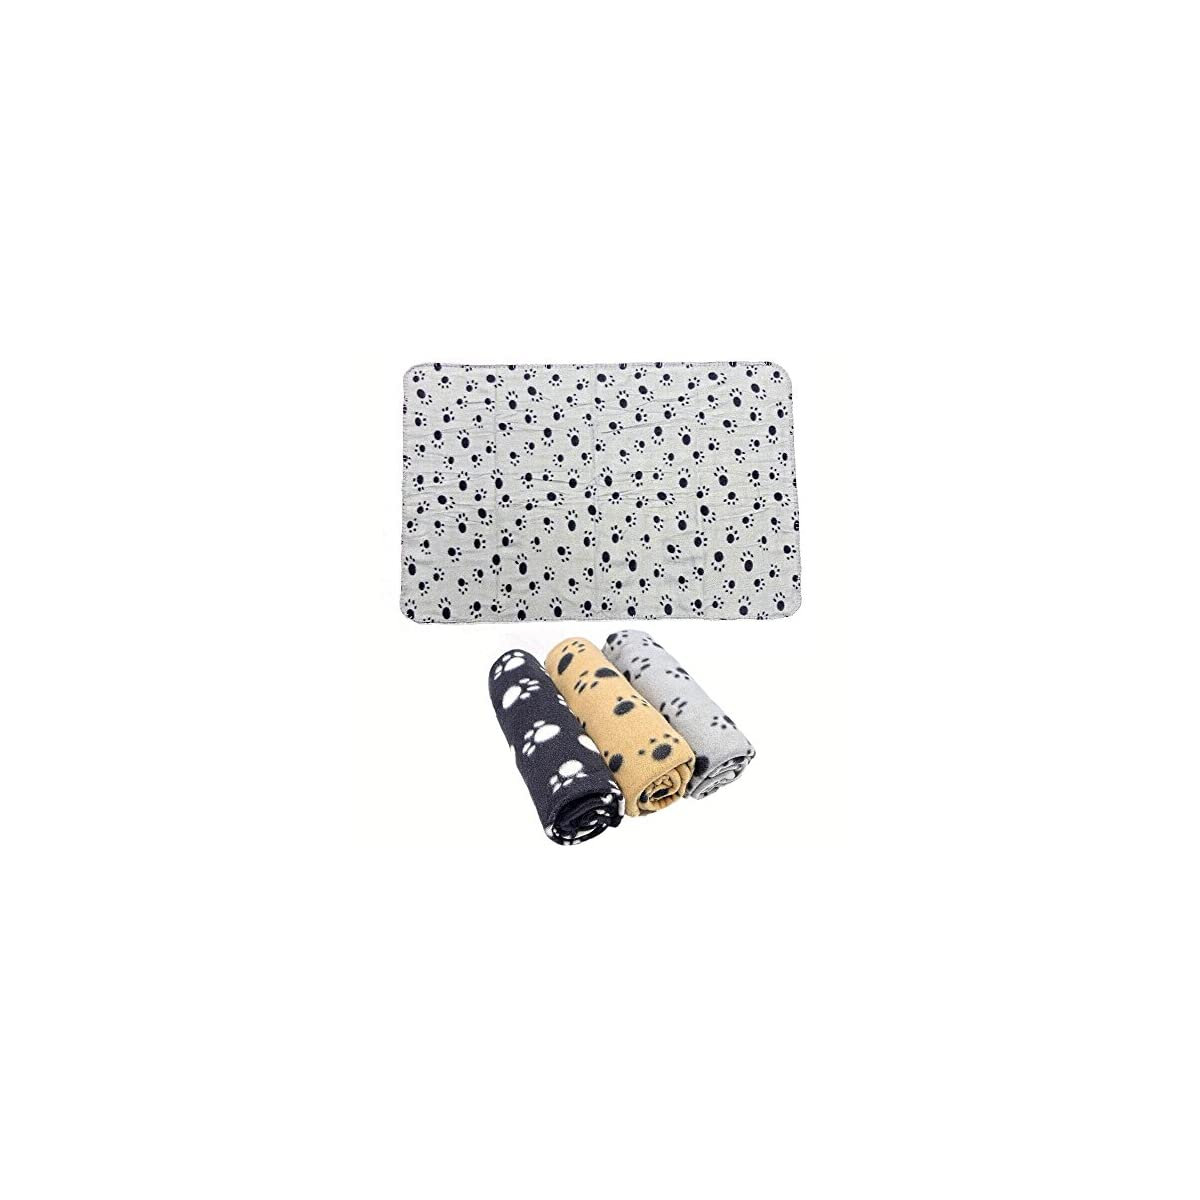 beige Morbida coperta per cane//gatto in caldo pile 3 pezzi